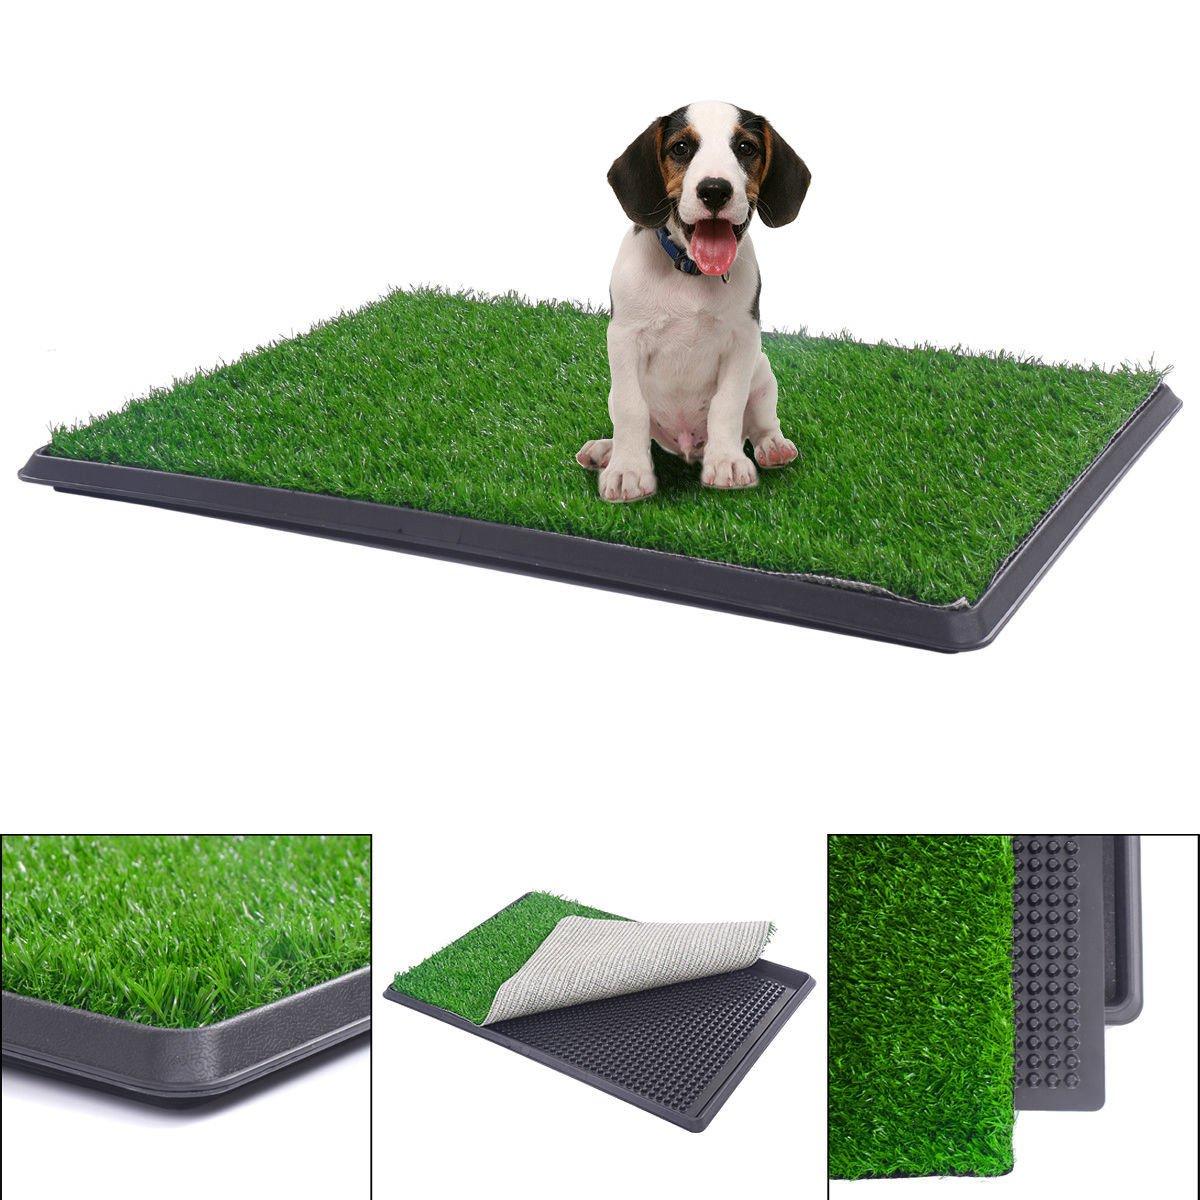 BringerPet 30''x20'' Puppy Pet Potty Training Pee Indoor Toilet Dog Grass Pad Mat Turf Patch